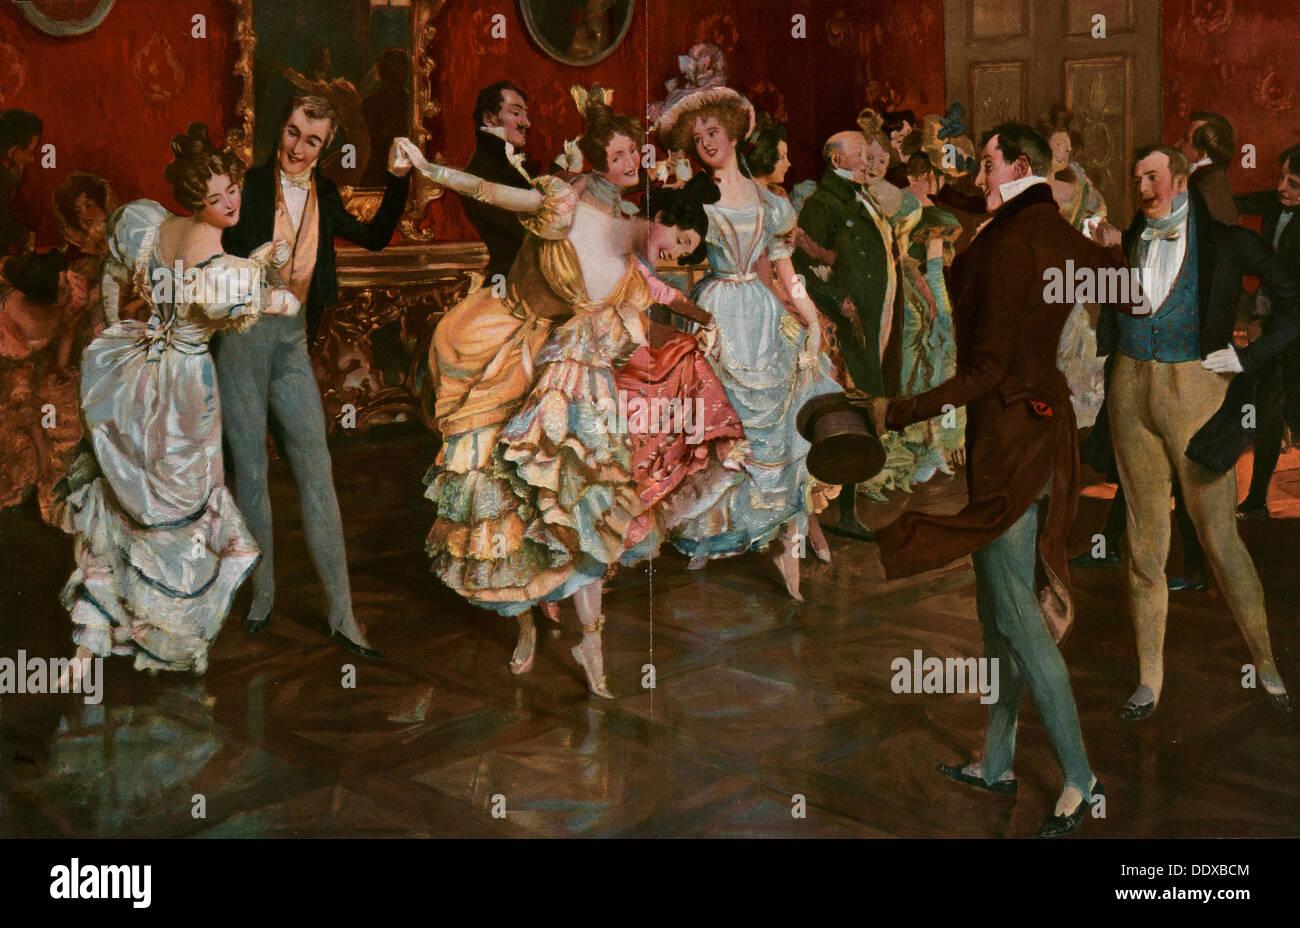 Pintura danza por Leopoldo Schmutzler 1864-1941, pintor bohemio, vivía en Alemania. Baile, bailarina, jóvenes, movimiento, hembra, macho Imagen De Stock